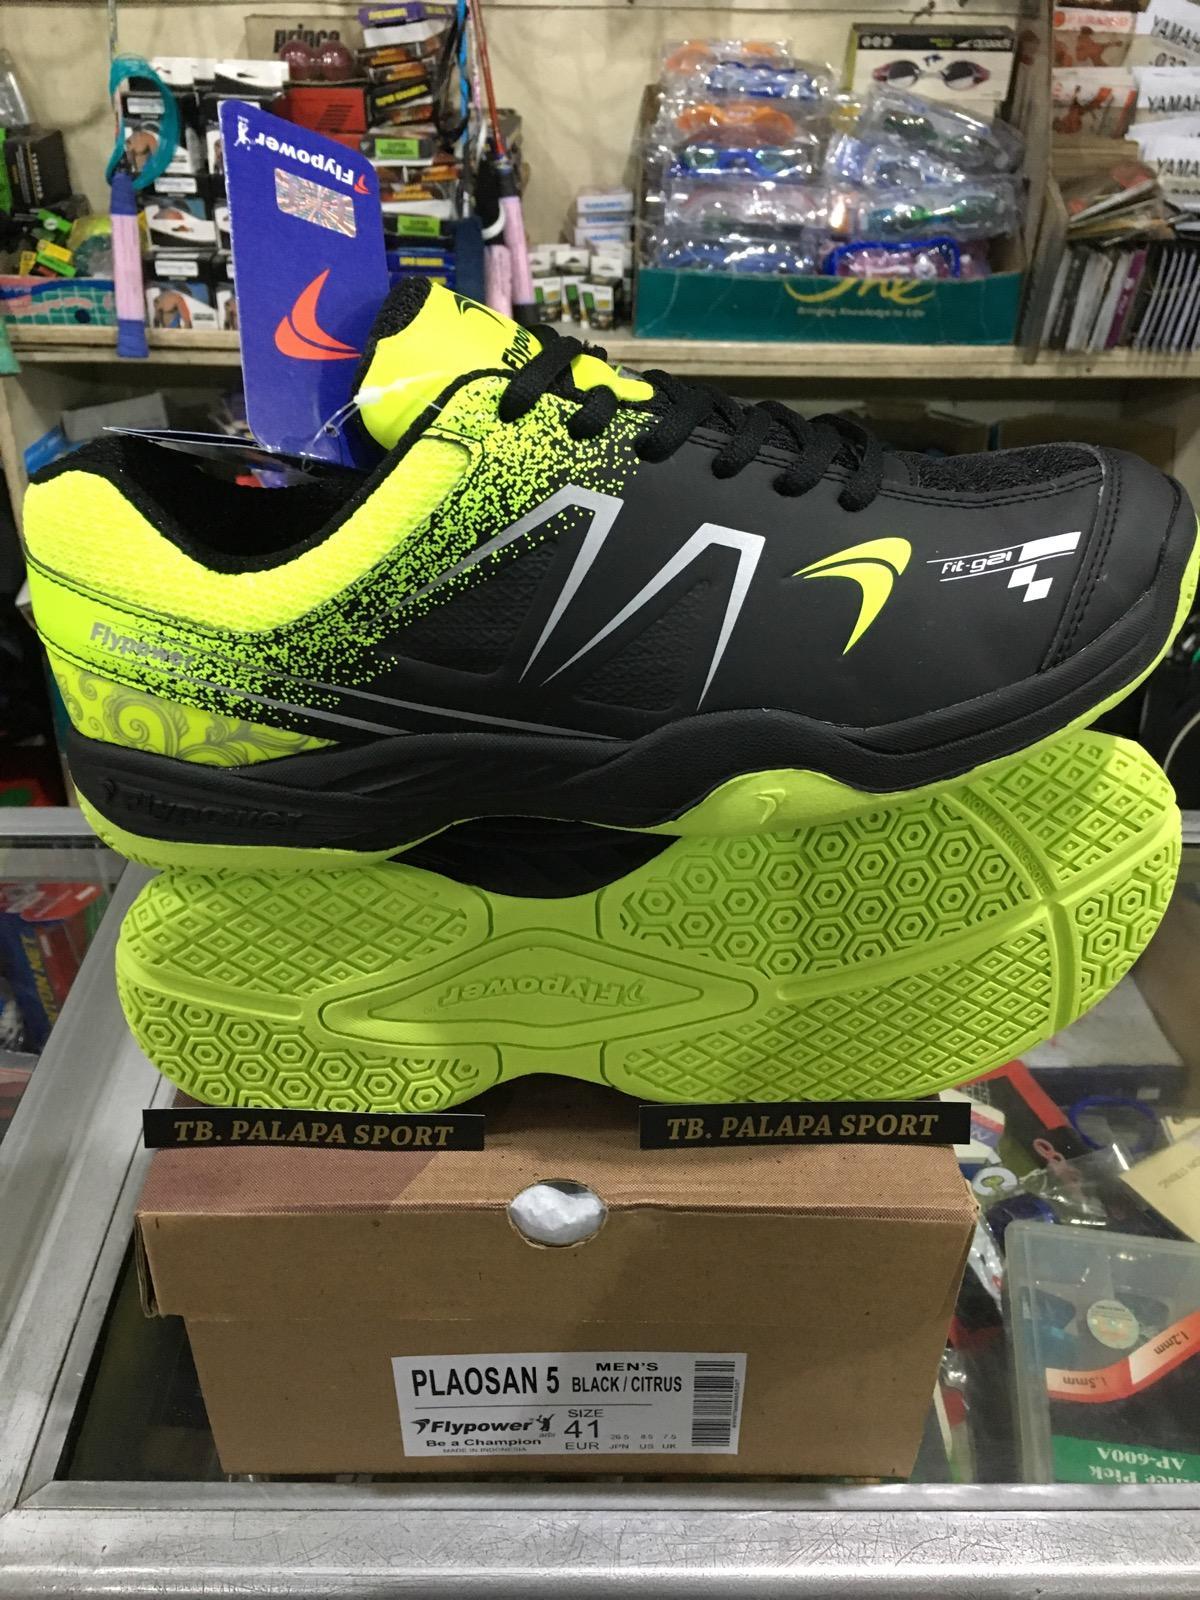 Flypower PLAOSAN 5 Sepatu Badminton Black Citrus